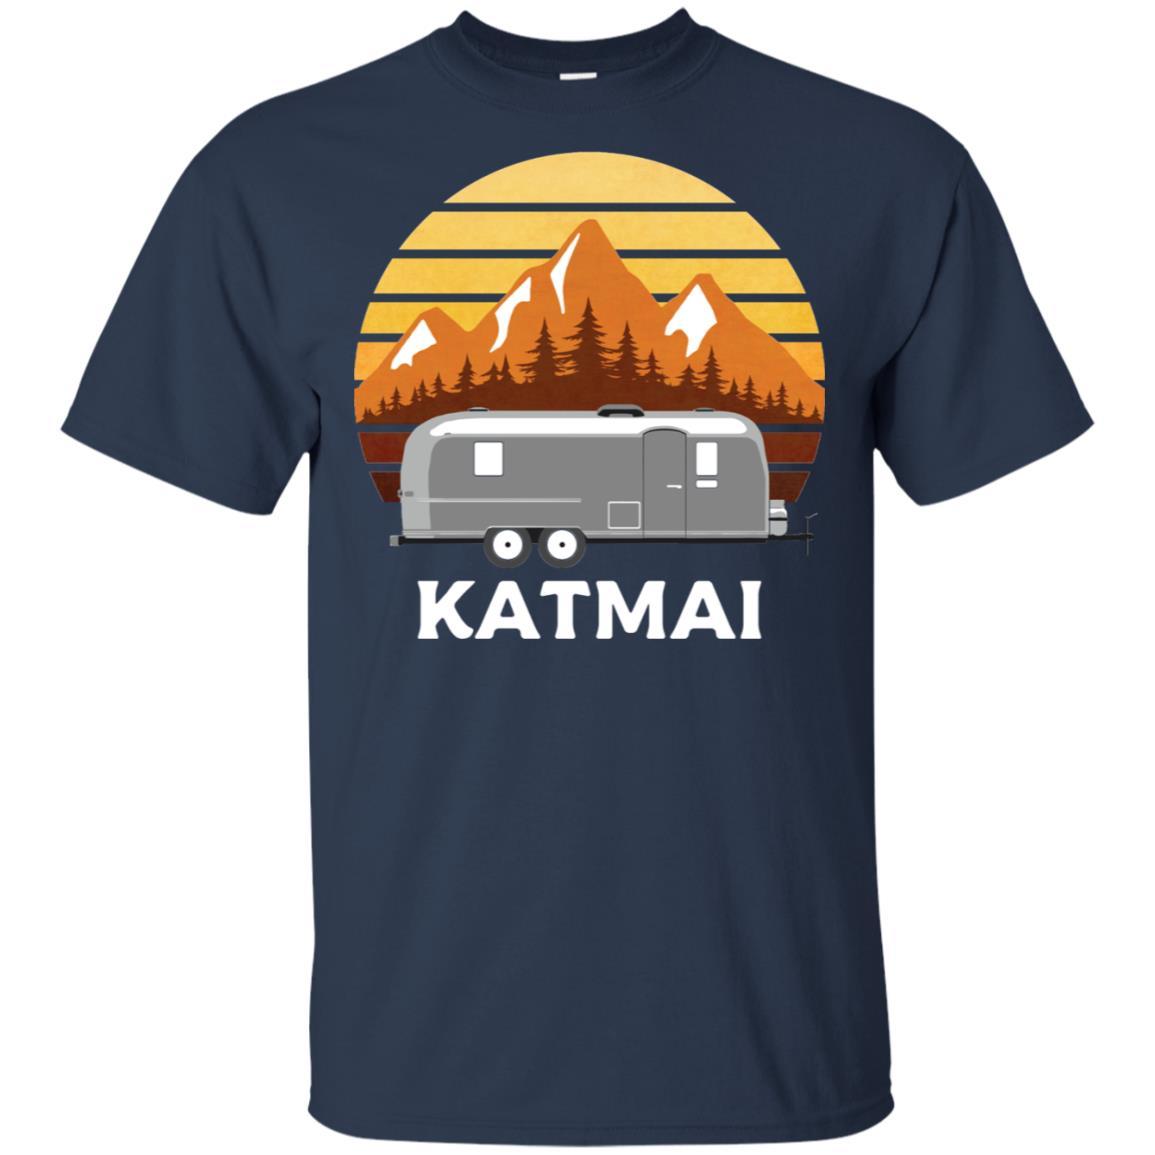 Katmai Camper, Retro Alaska Trailer Gift Unisex Short Sleeve